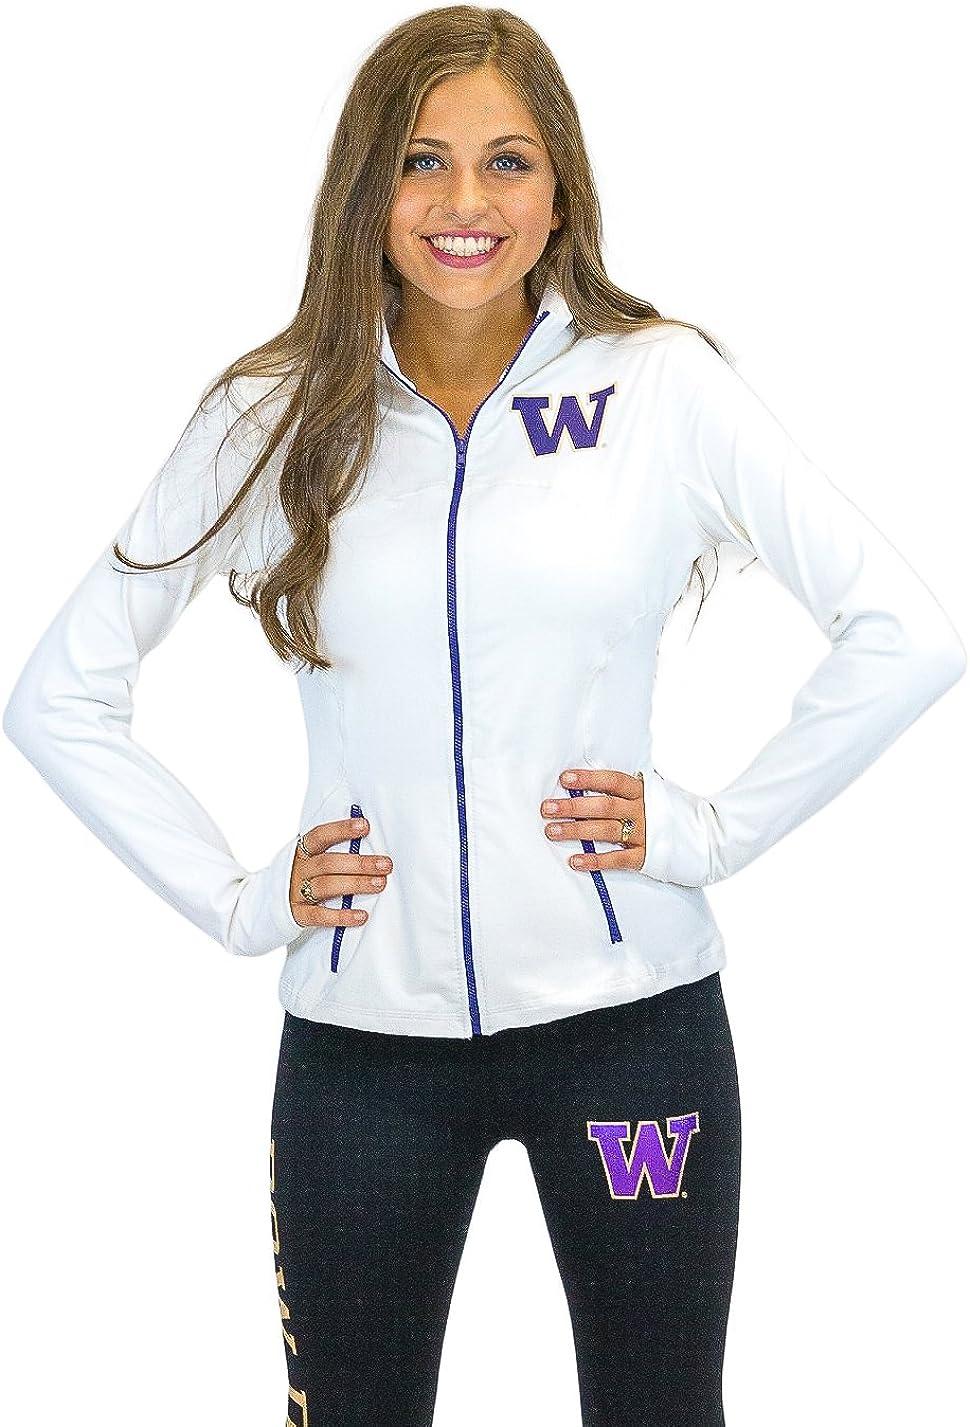 Twin Vision Activewear Washington Track Rhinestone Limited time Arlington Mall cheap sale Huskies Yoga